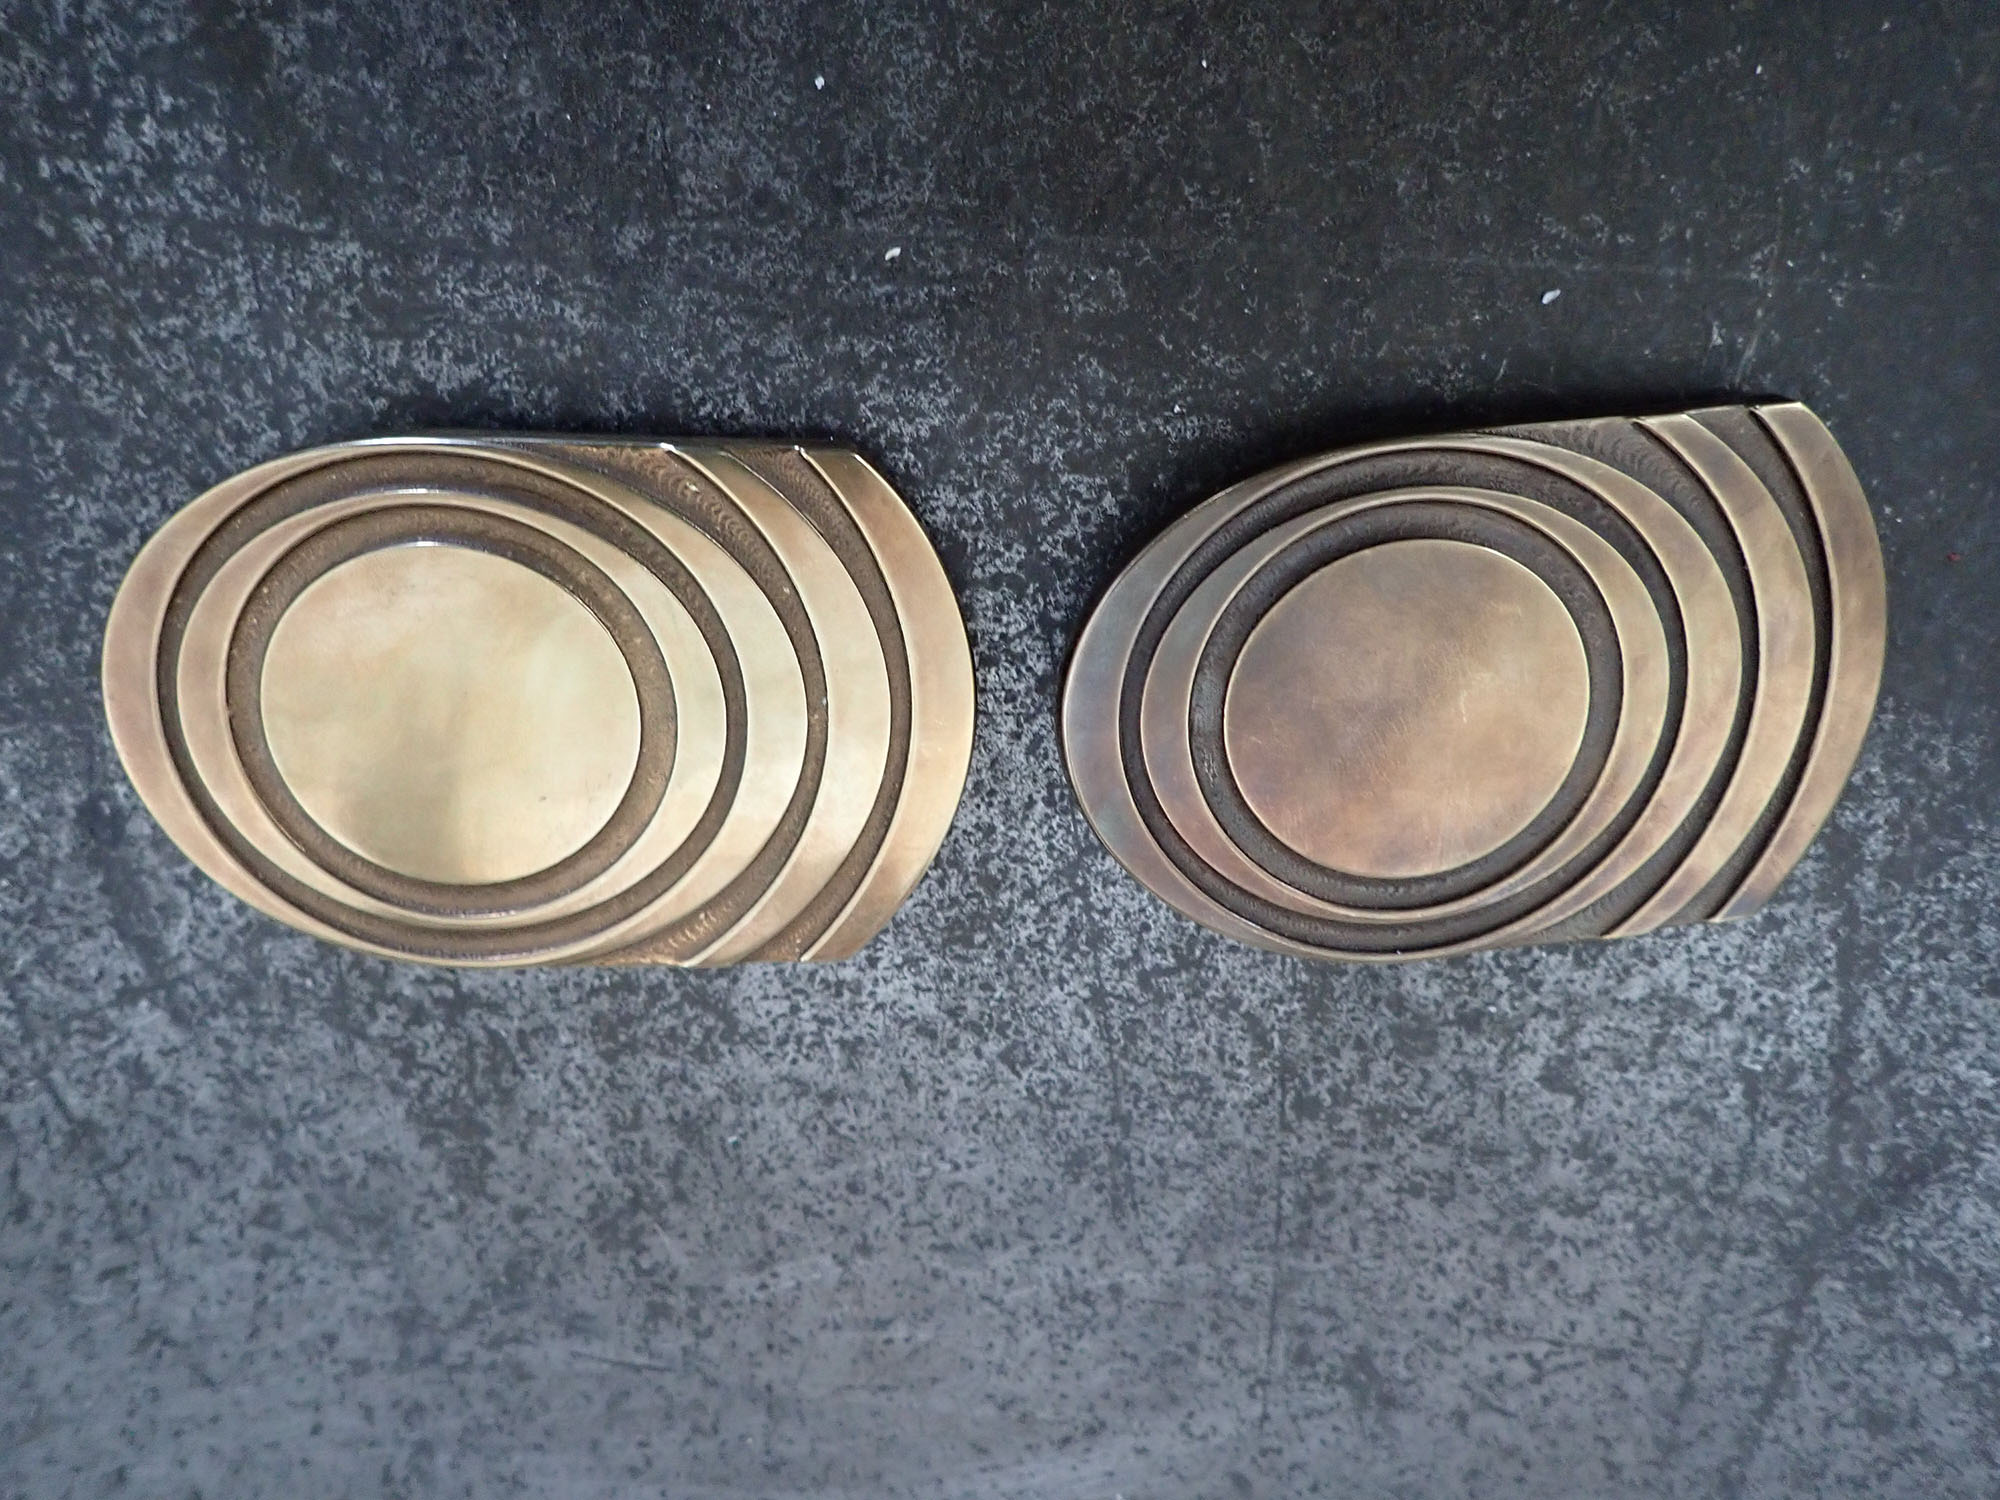 O))) belt buckle production, Czech February 2019